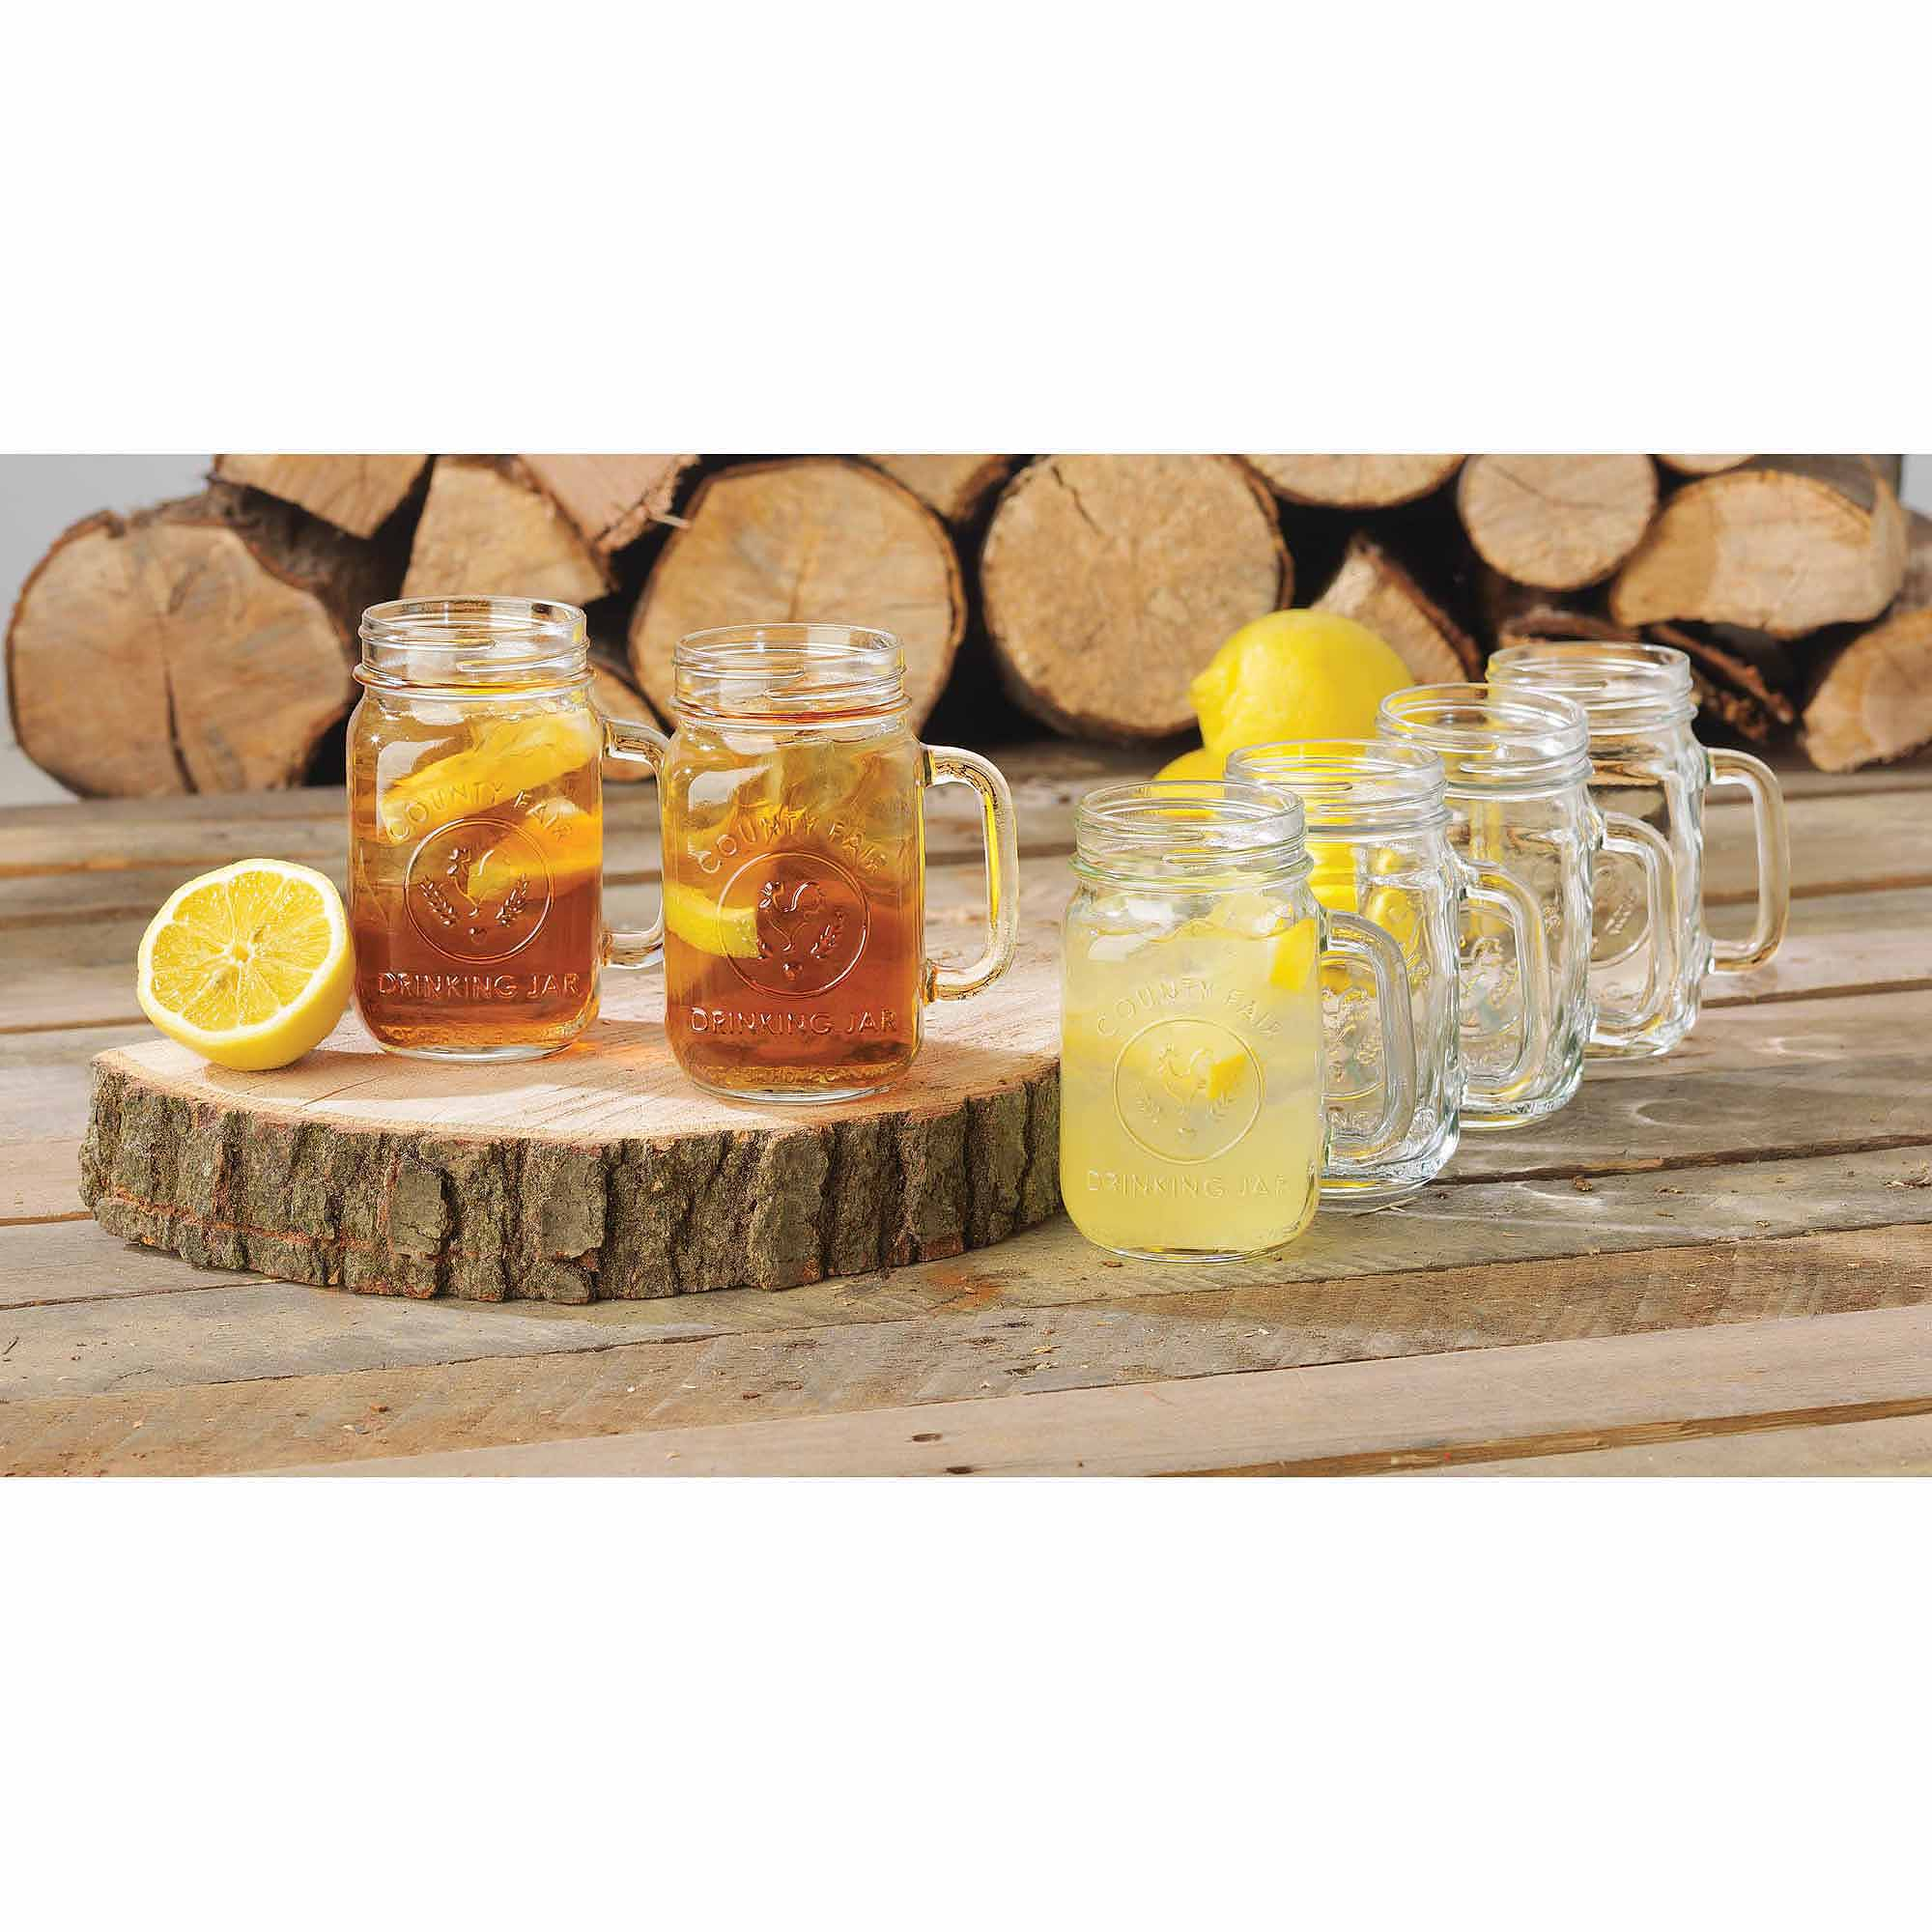 Libbey Handled Drinking Jar 8-Piece Set, Glass by Libbey